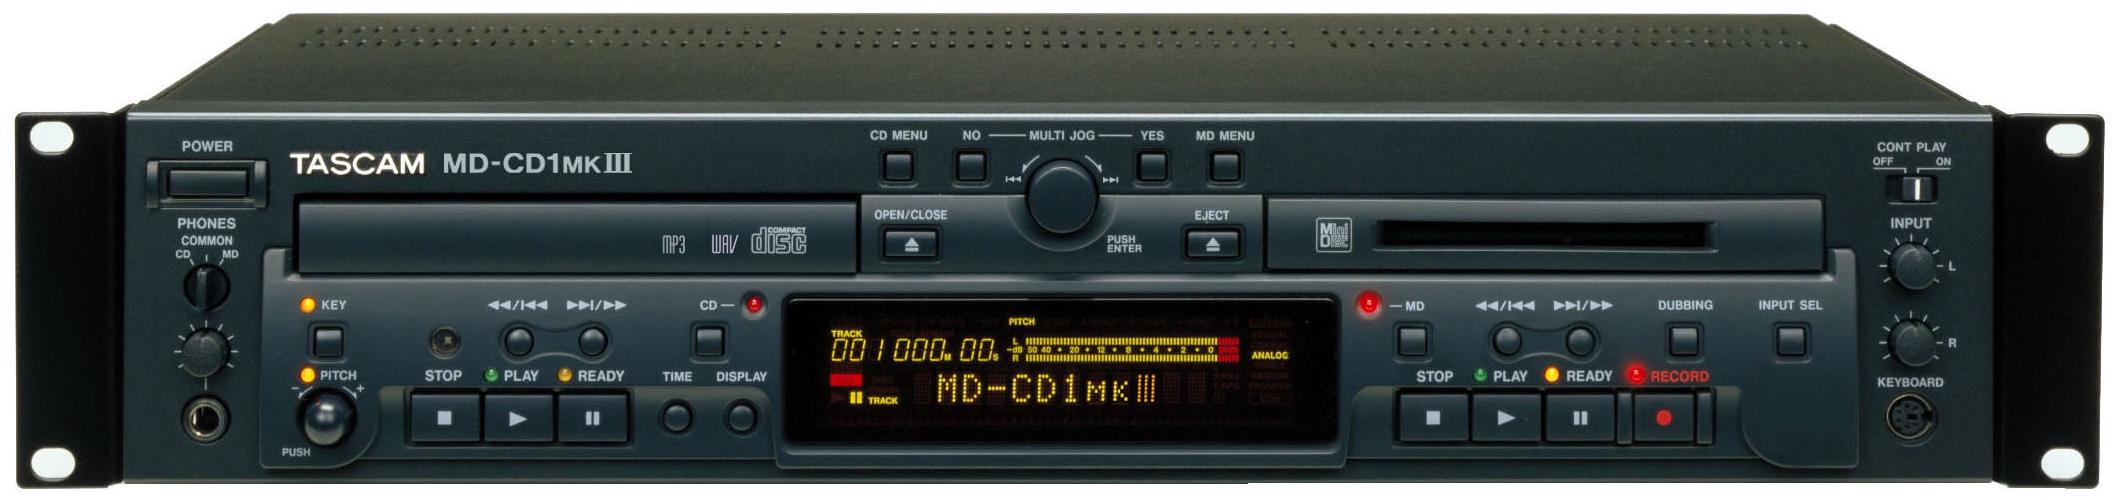 radio md1 radio